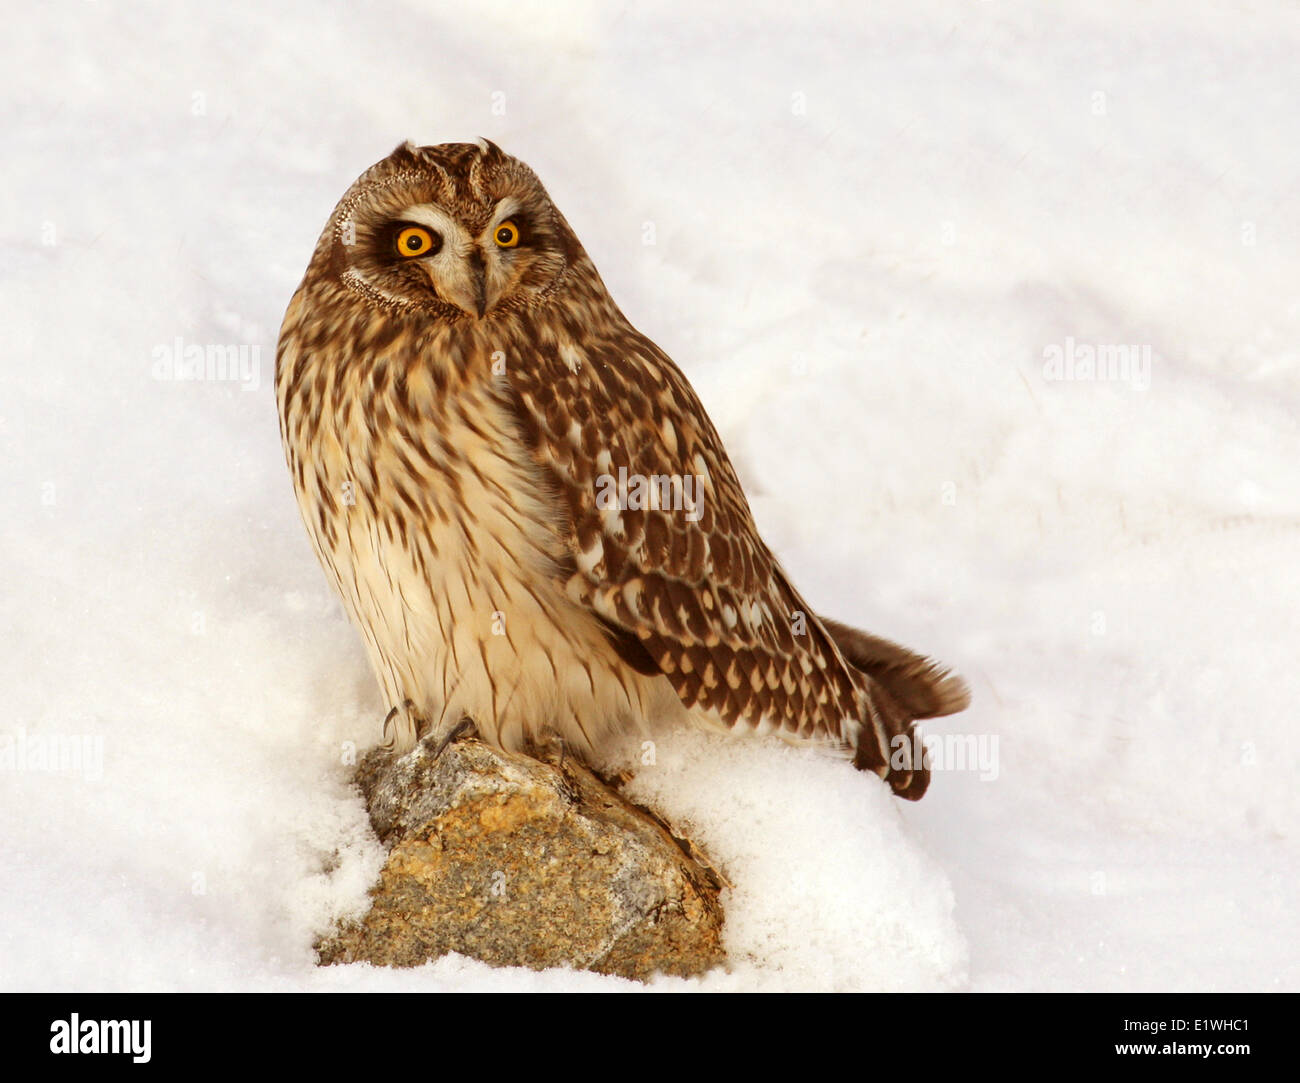 Short-eared Owl, Asio flammeus,  sat in the snow, at Gardiner Dam, Saskatchewan - Stock Image